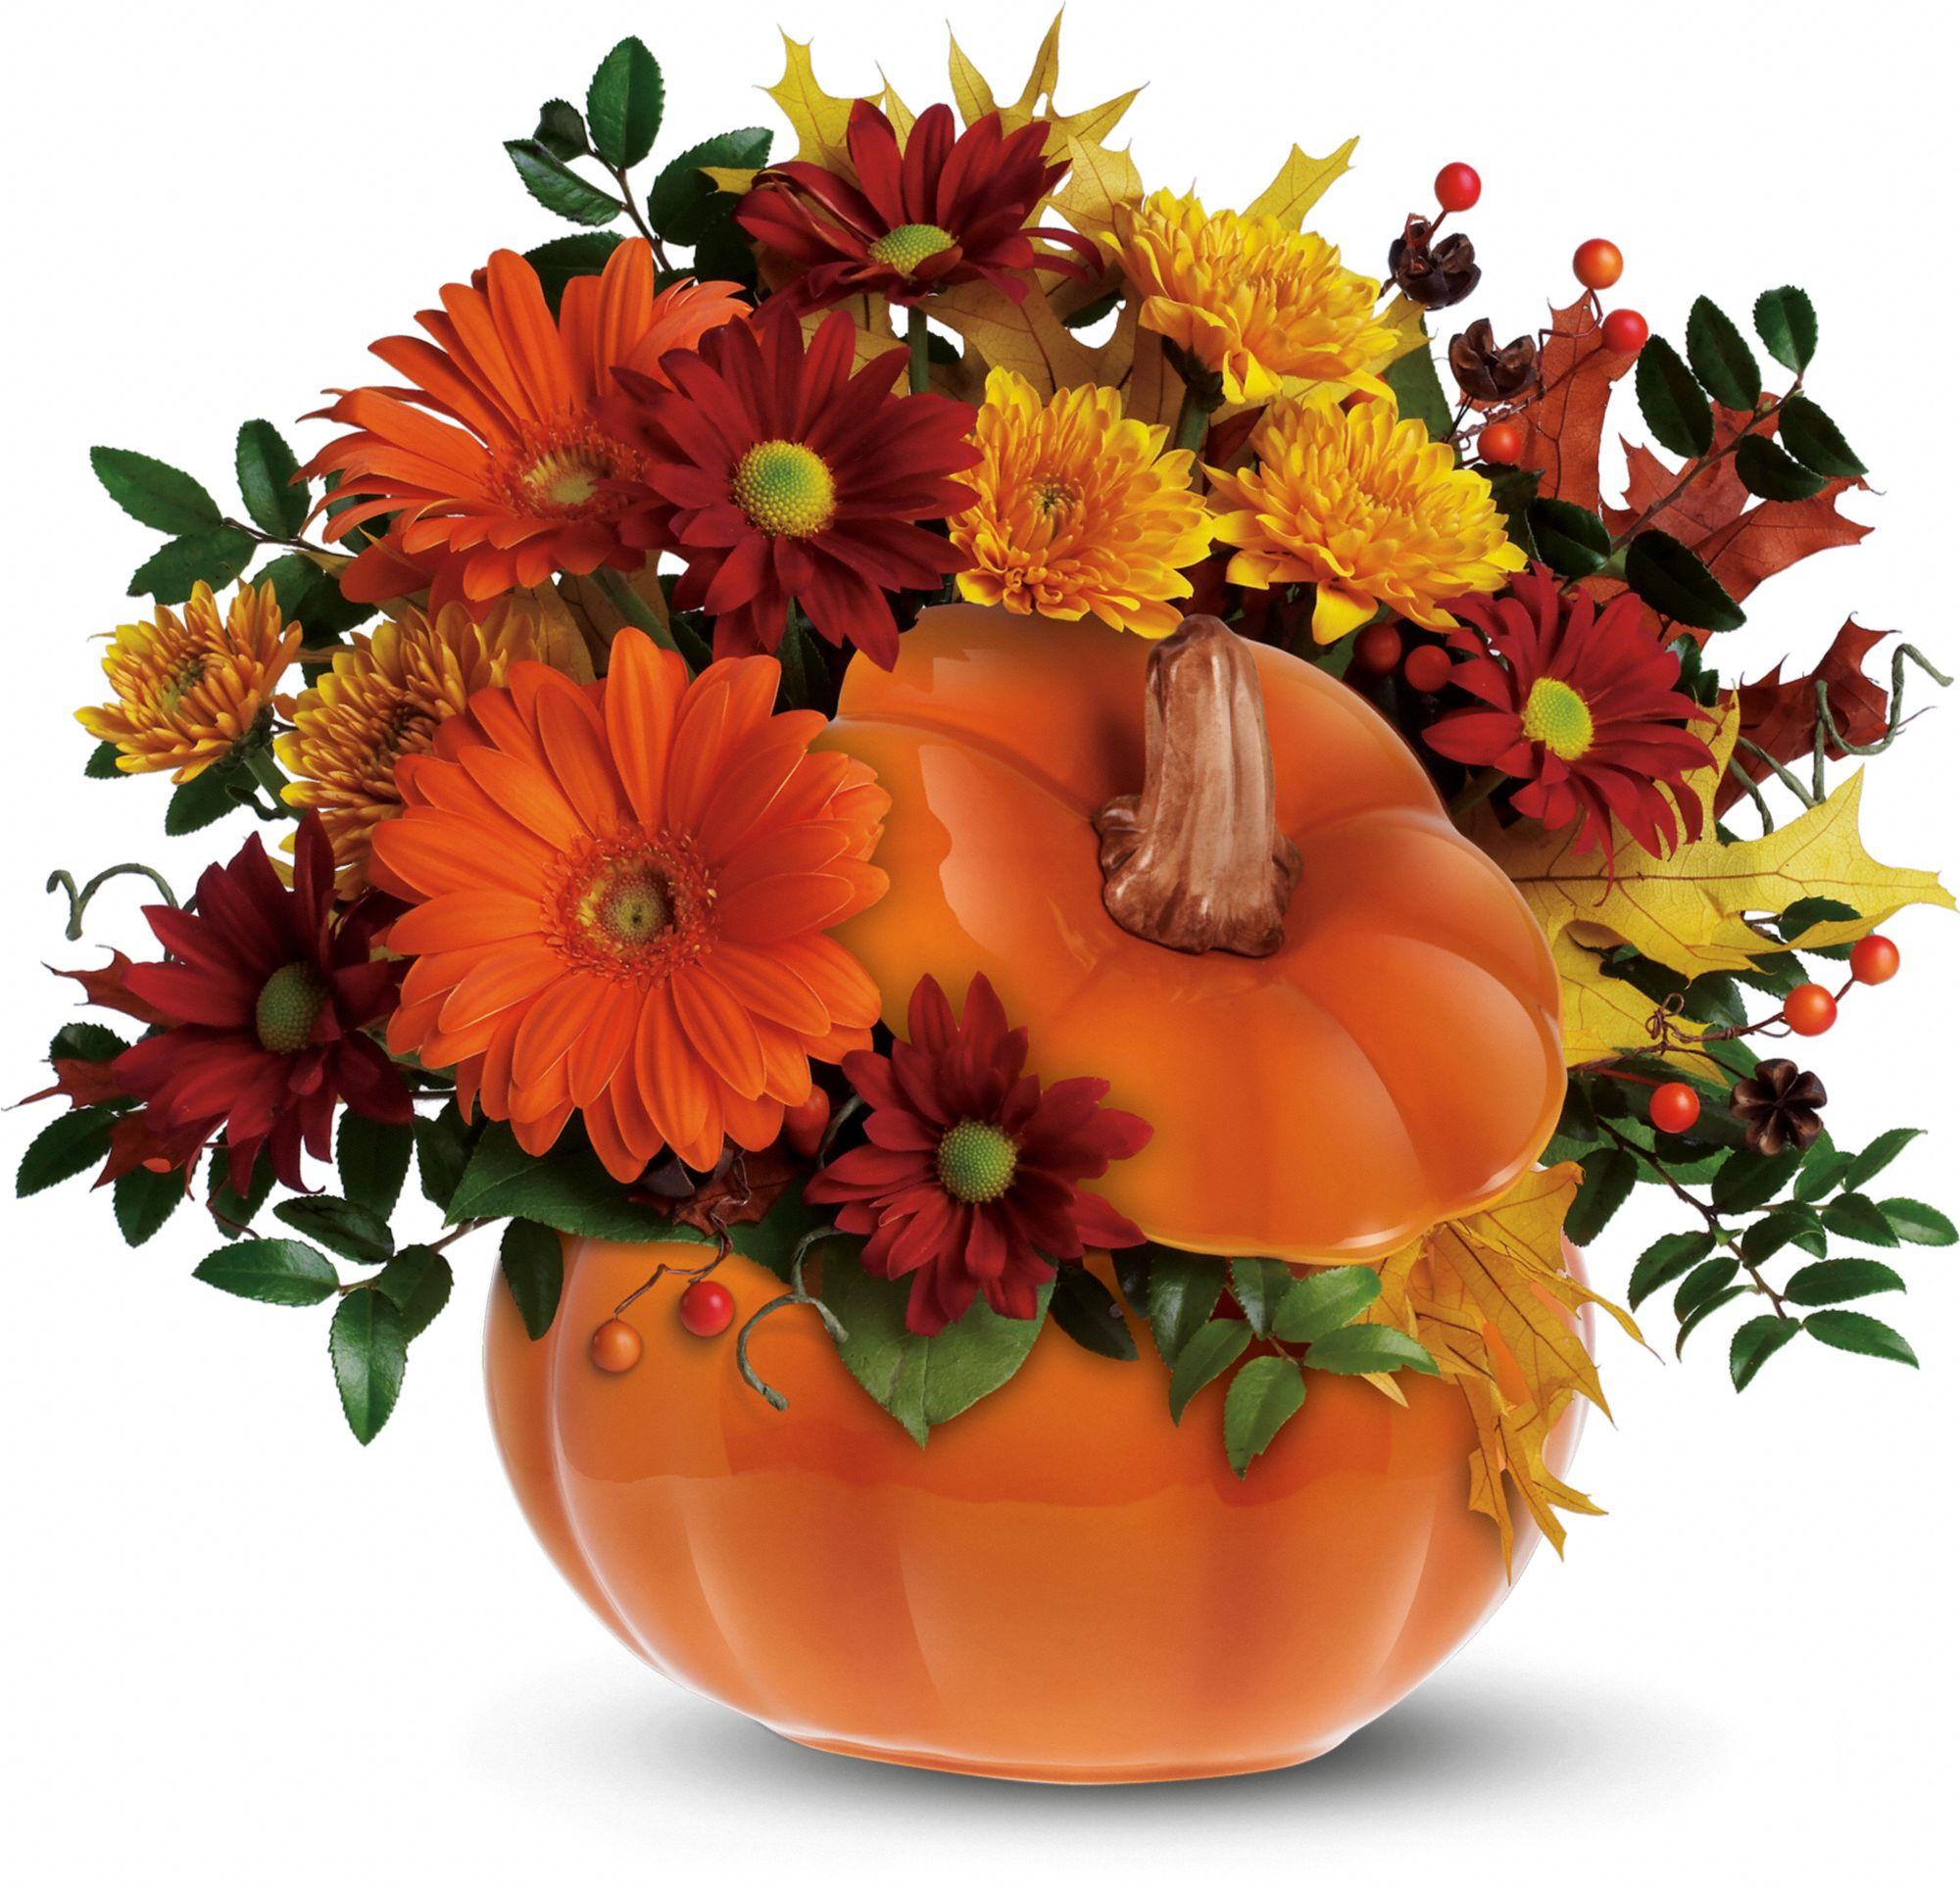 Teleflora's Country Pumpkin Flowers